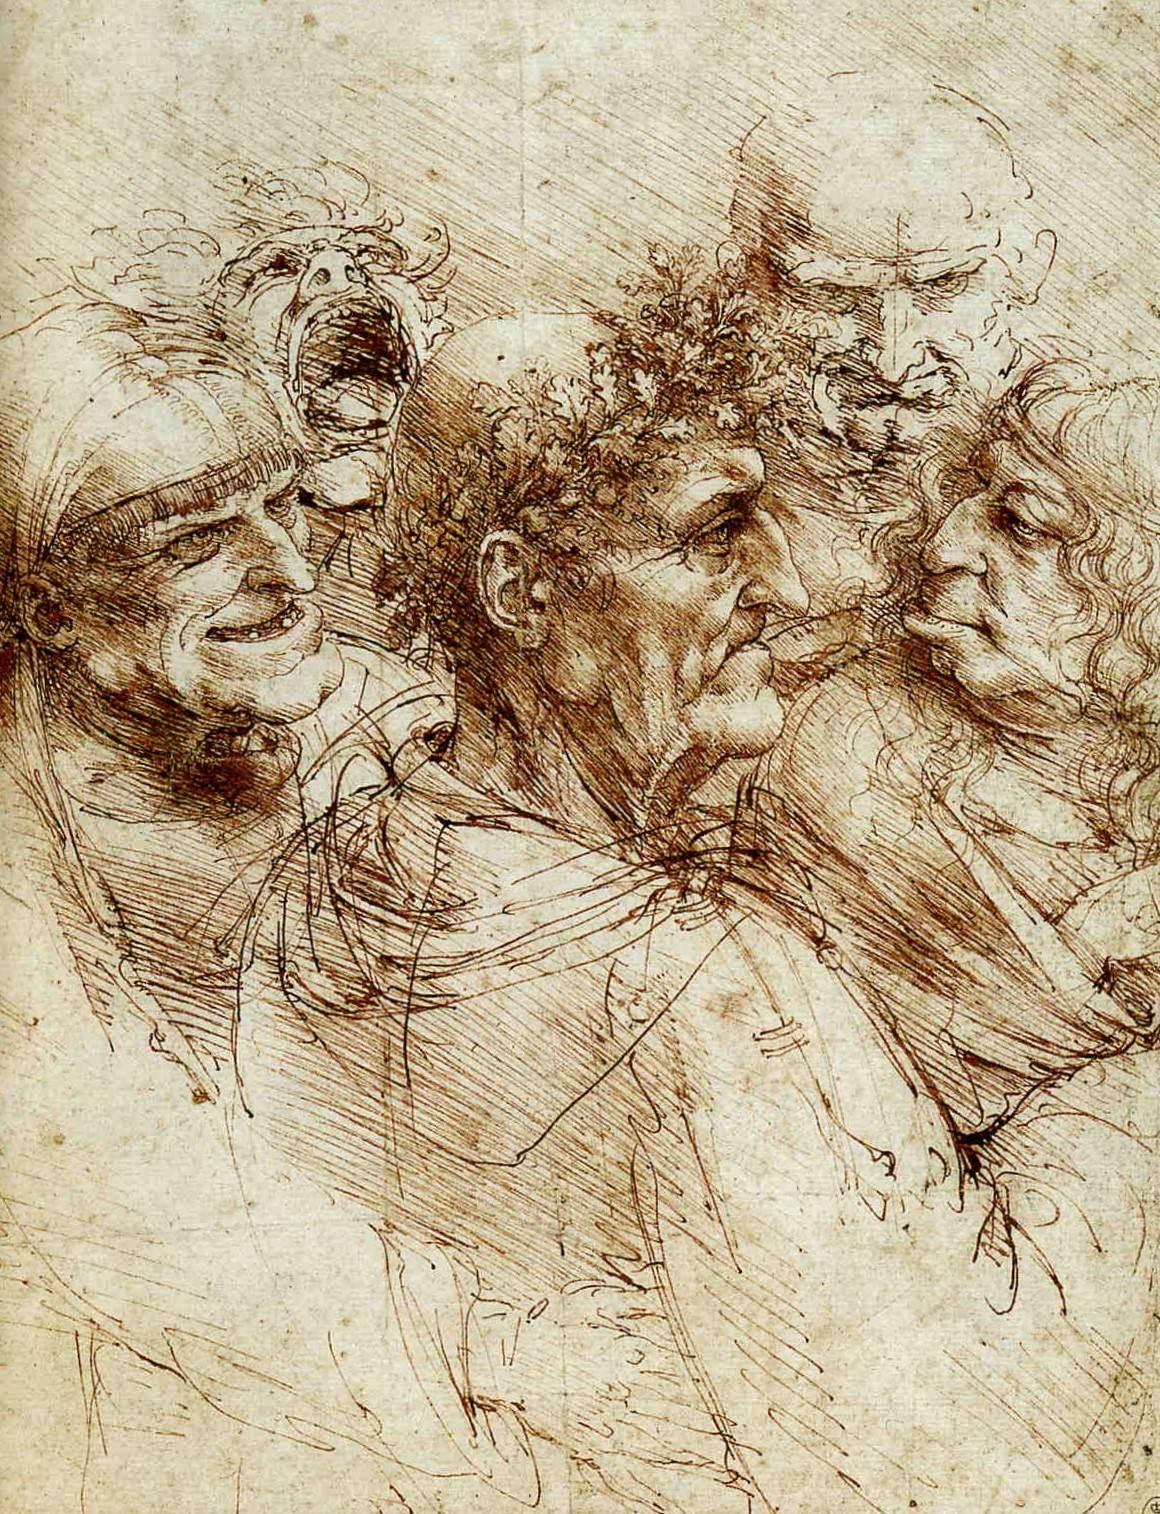 Leonardo da Vinci, Grotesque Heads.